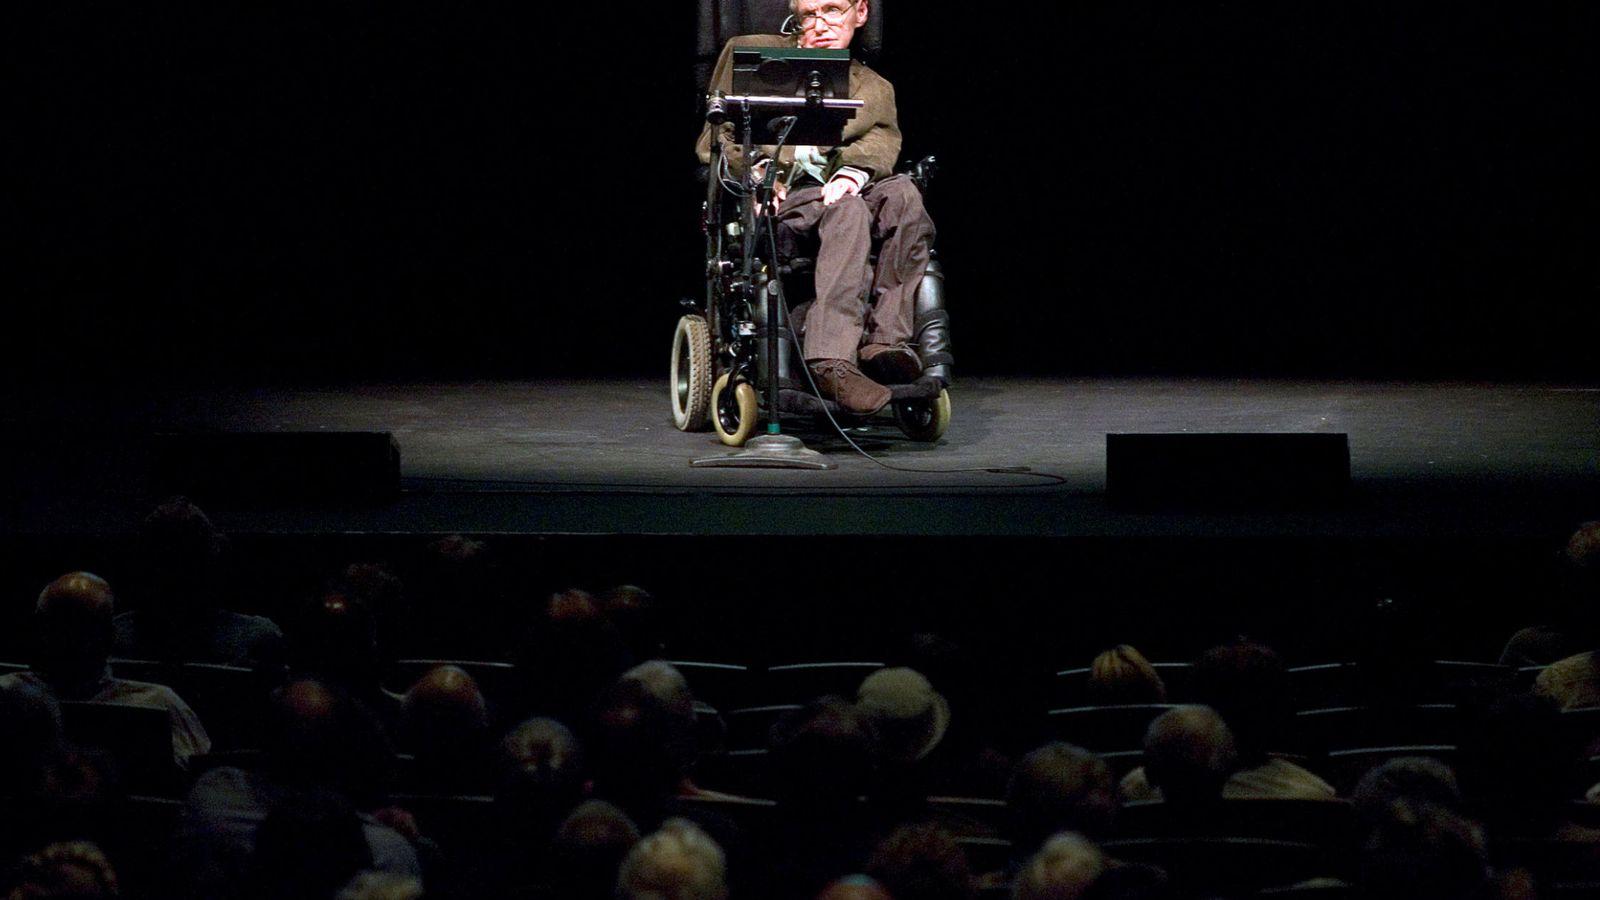 Foto: El profesor, durante una charla en Berkeley en 2007. (Reuters/Kimberly White)